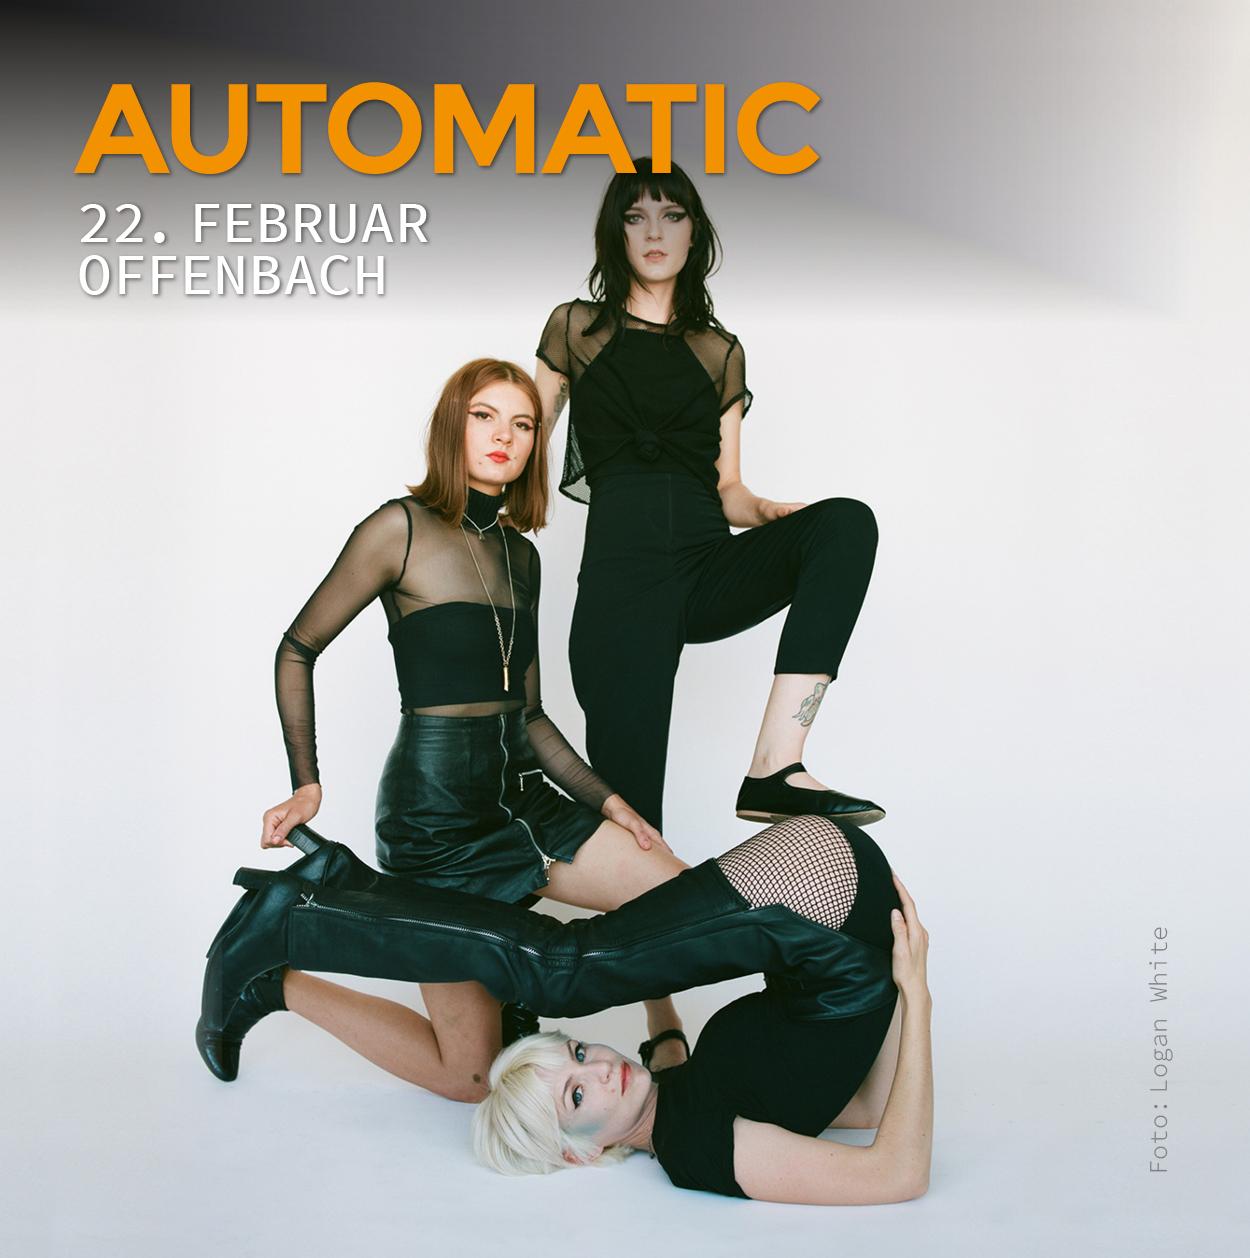 22. Februar, Offenbach, Hafen 2, Hafenfestival, Automatic